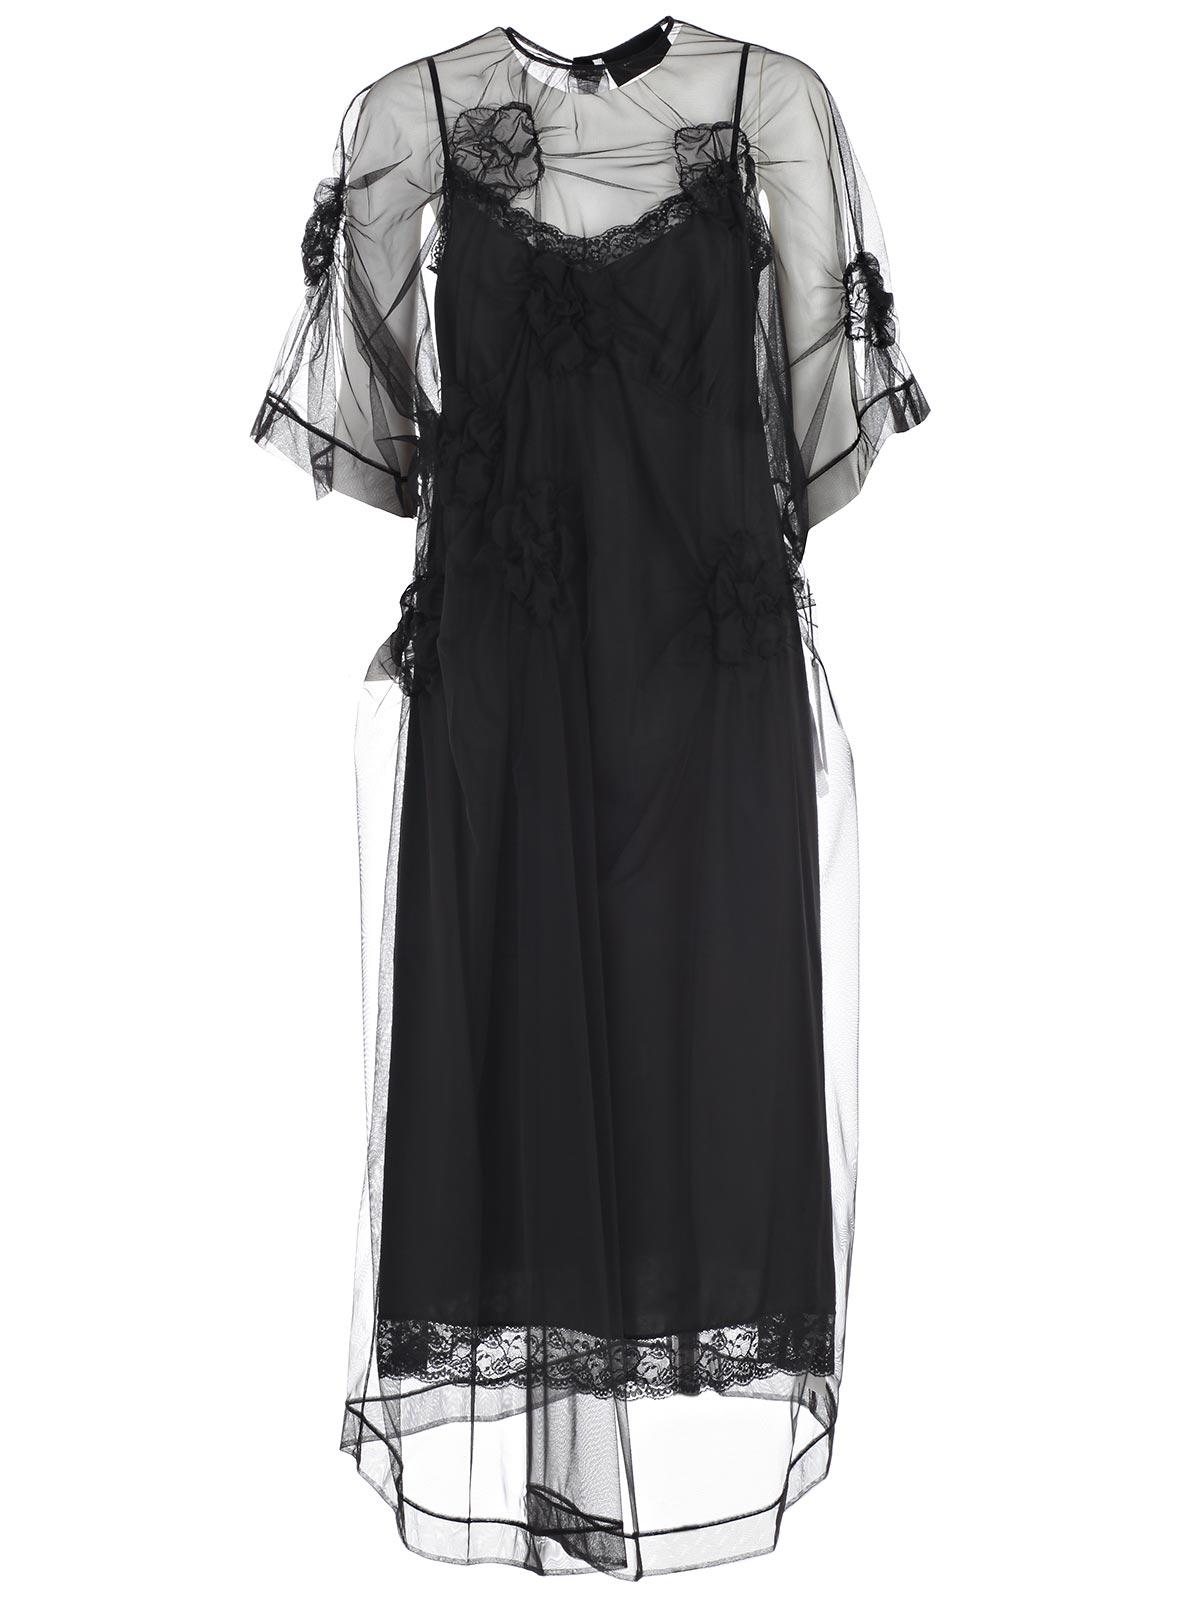 Picture of SIMONE ROCHA DRESS